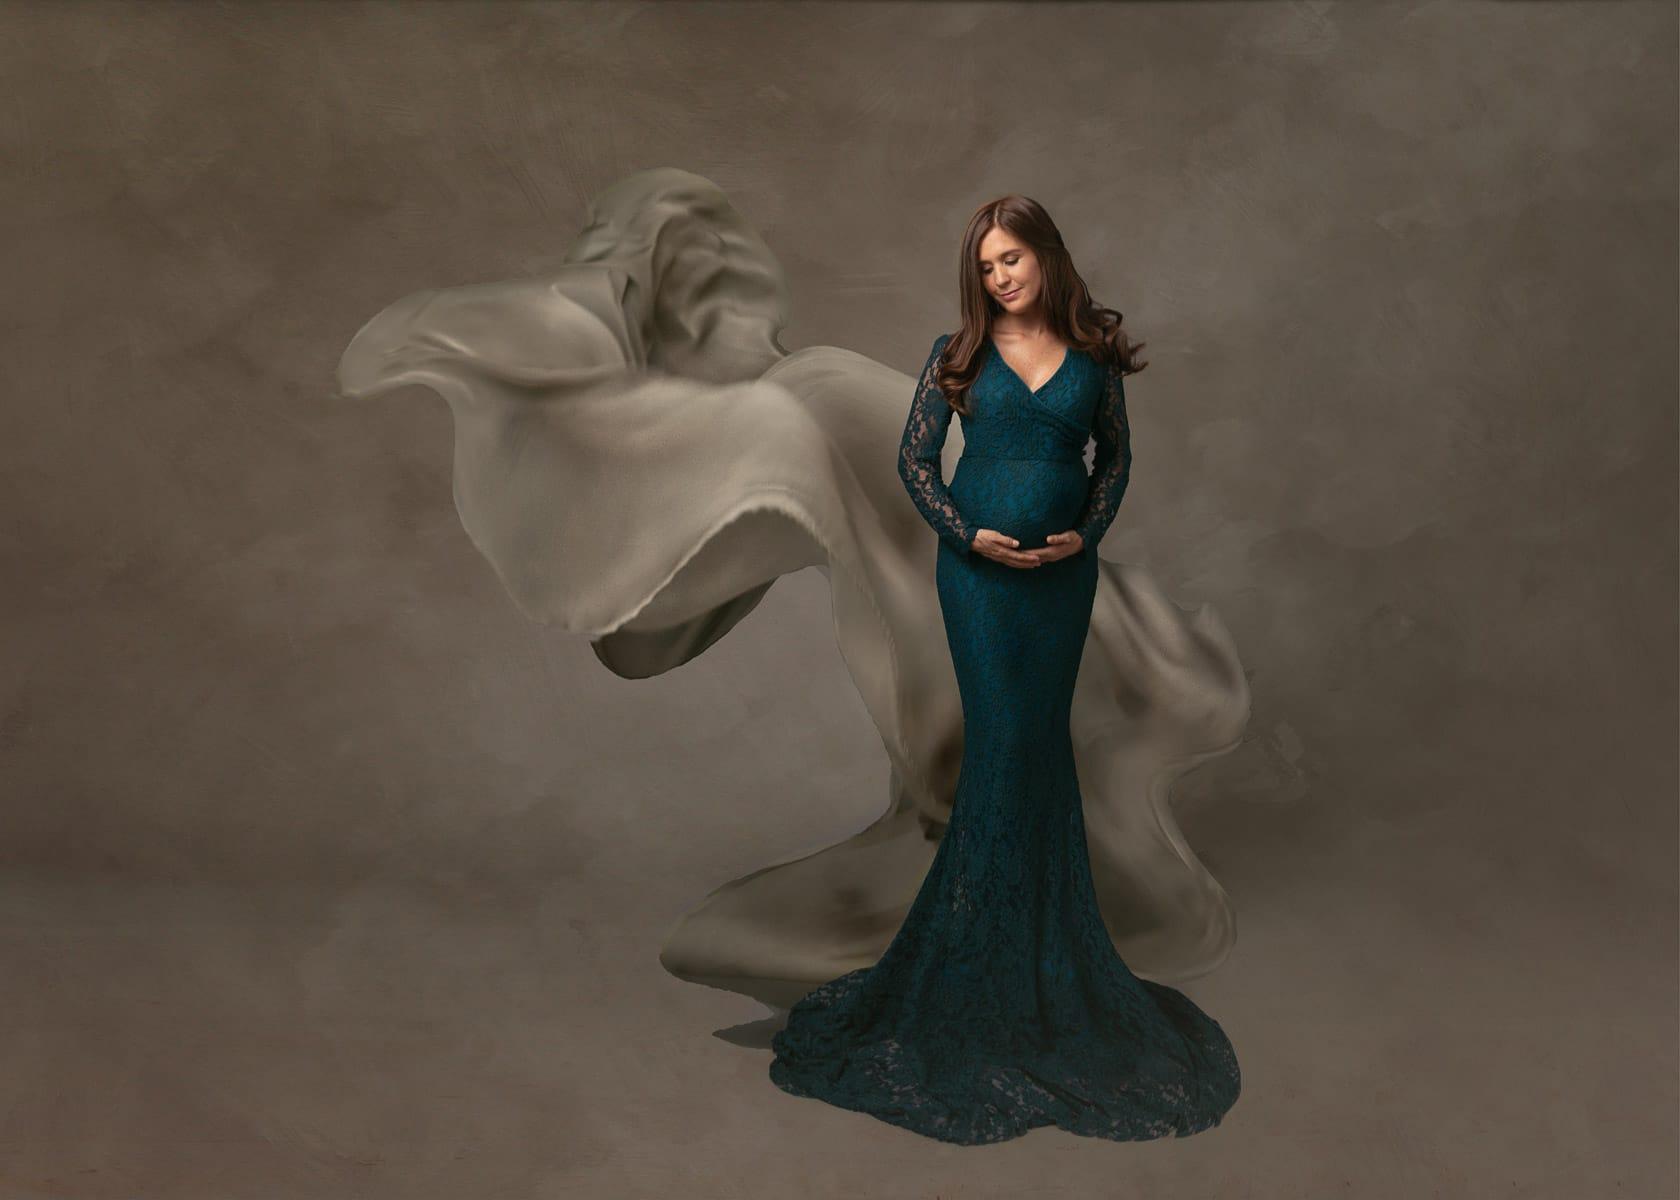 WORKSHOP FOTOGRAFIA MATERNITY NEWBORN PETIT MONDE KRISTINA RECHE 23 - Maternity